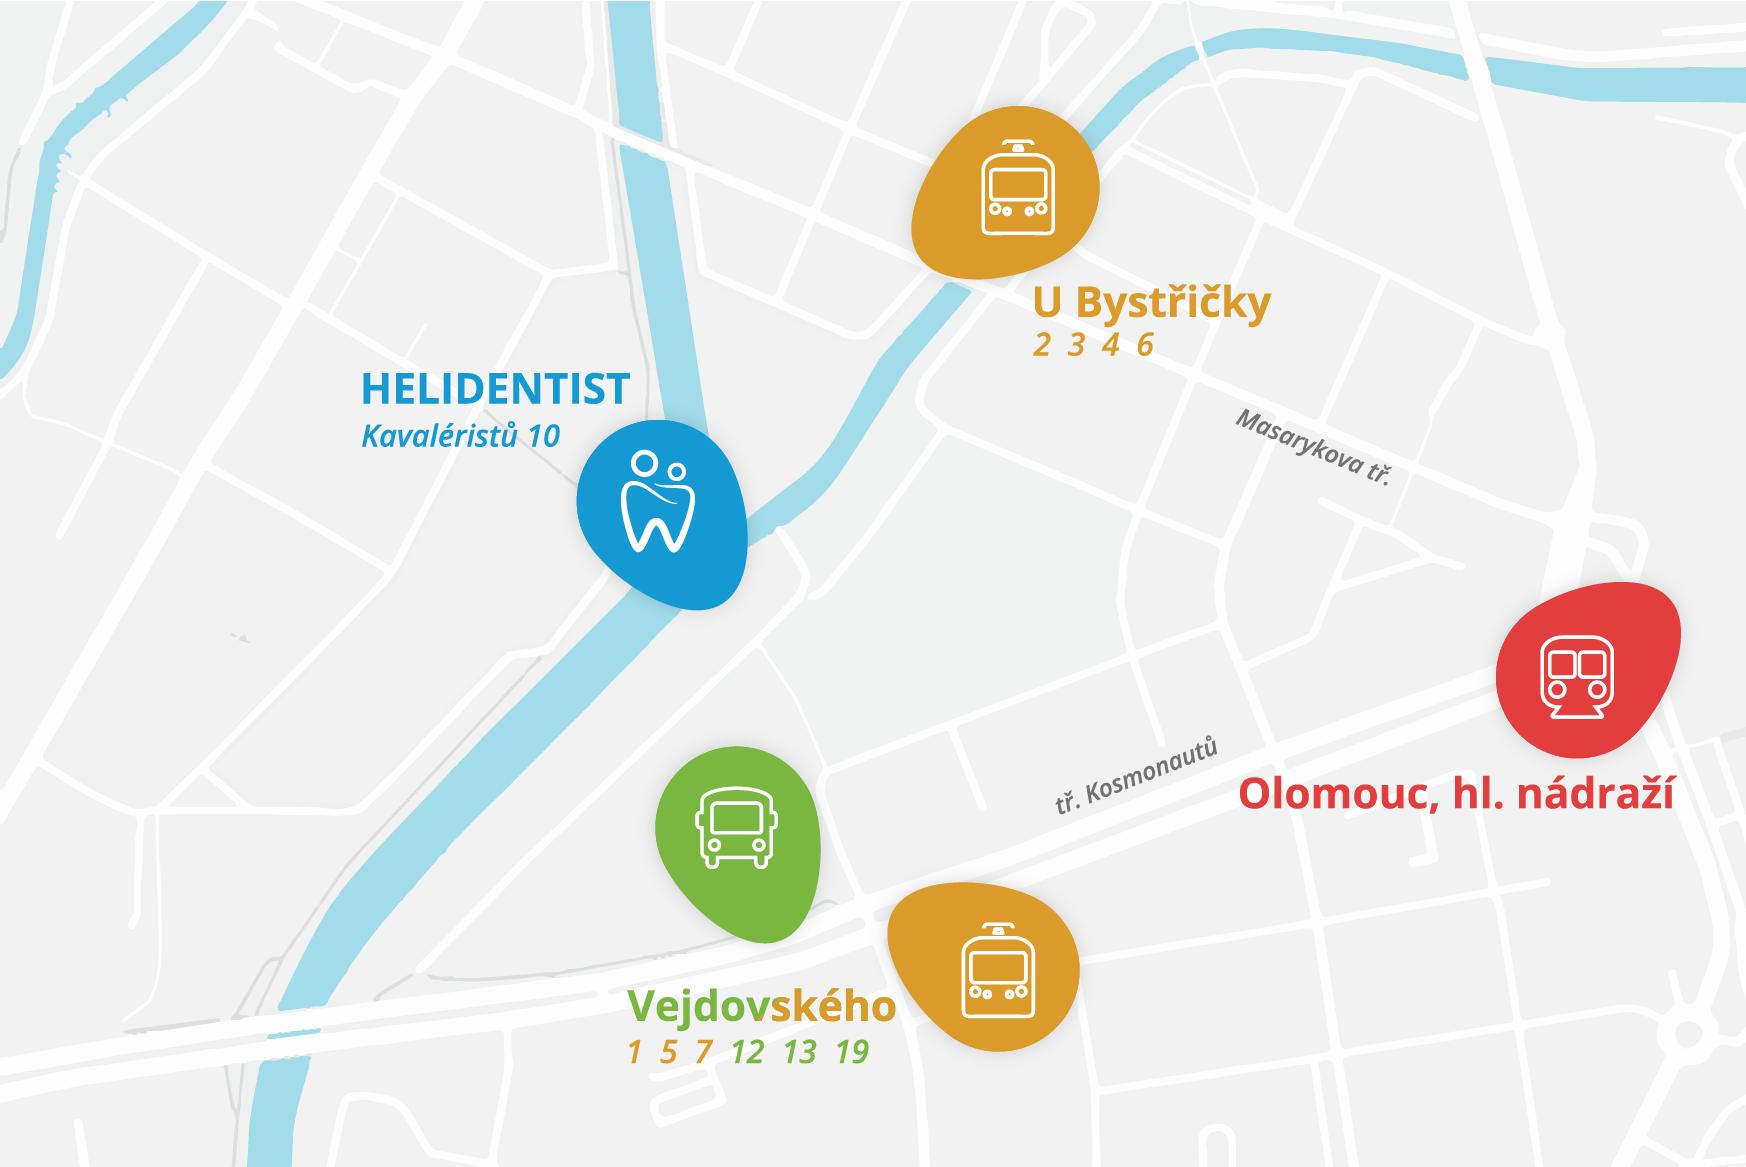 Mapa - Helidentist